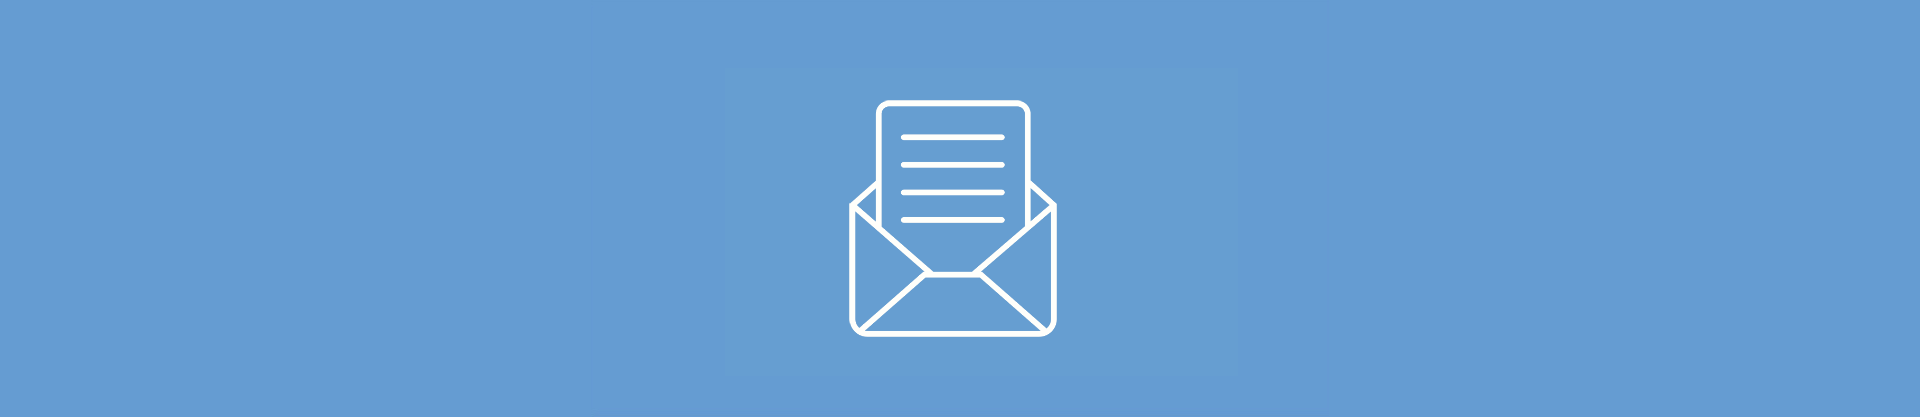 Newsletter TREUHAND | SUISSE